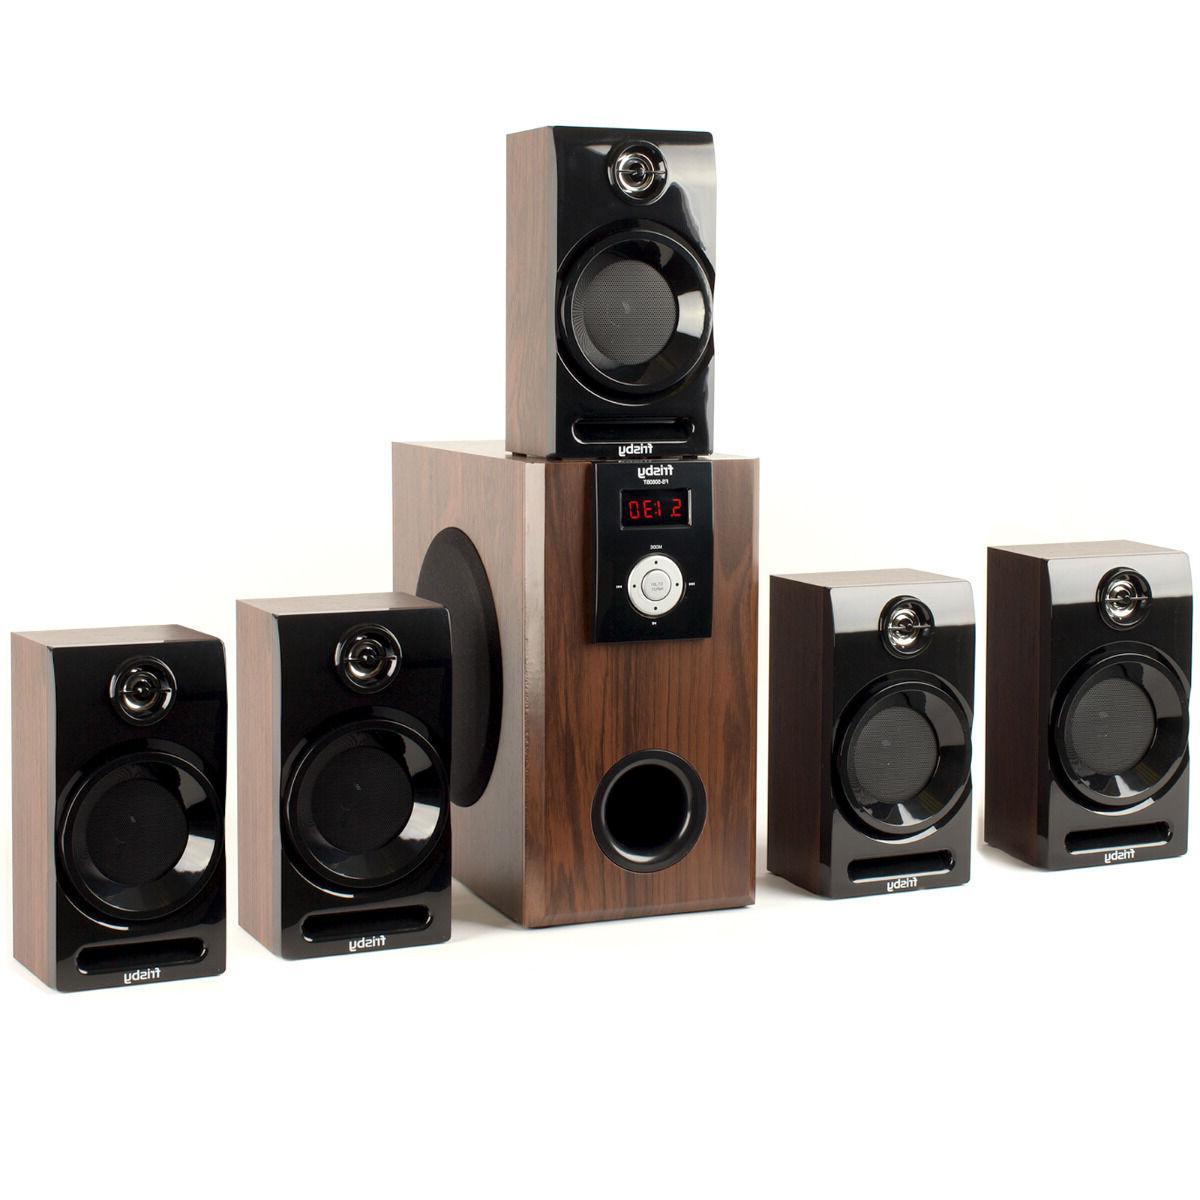 fris 5 1 surround sound